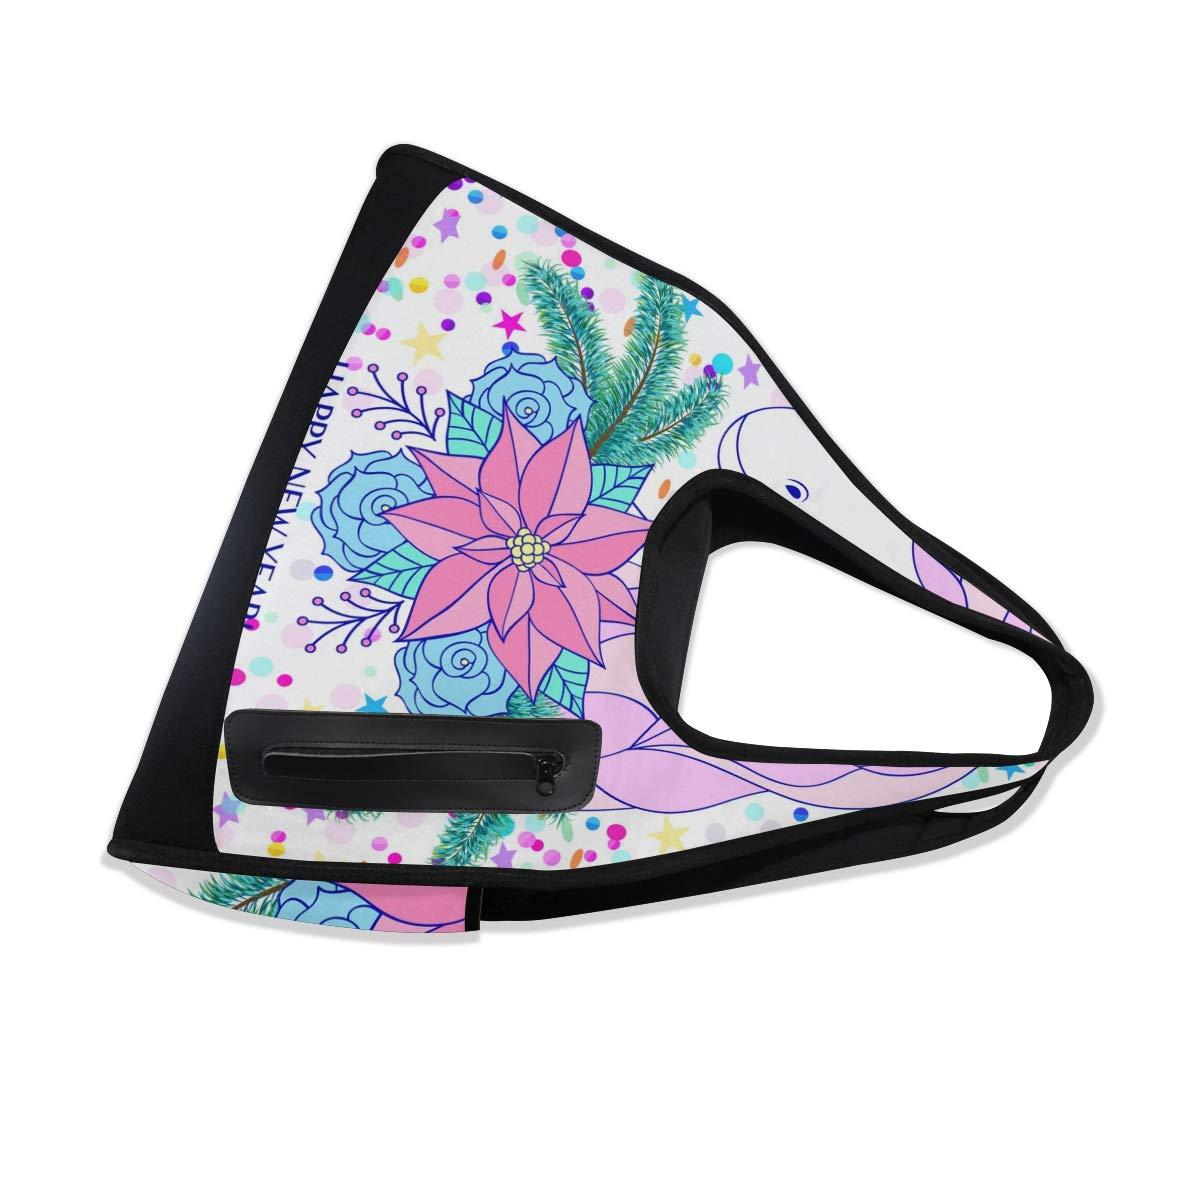 Gym Bag Sports Holdall Colorful Unicorn Canvas Shoulder Bag Overnight Travel Bag for Men and Women